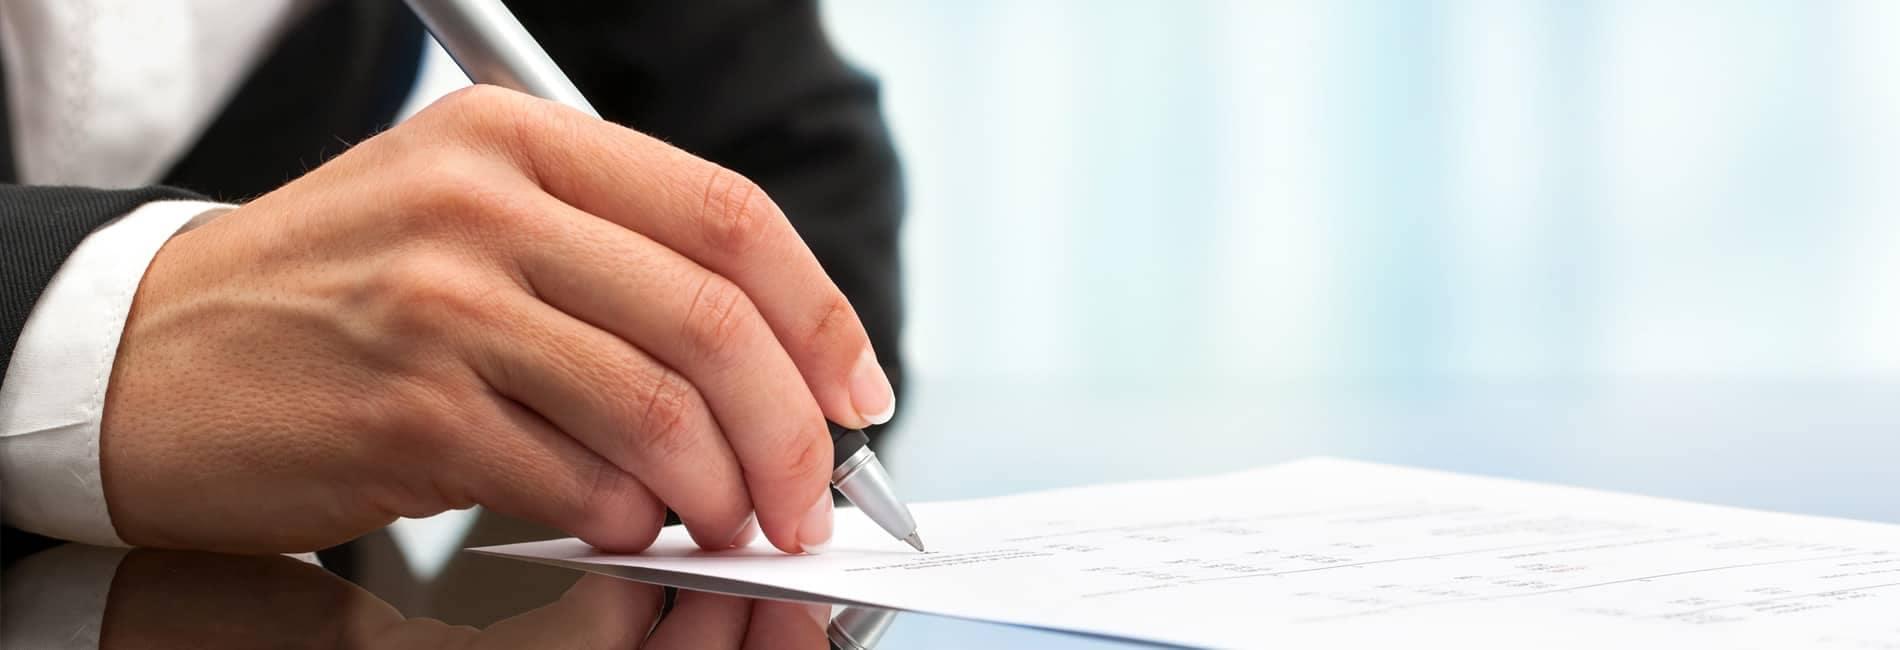 Man signs finance document